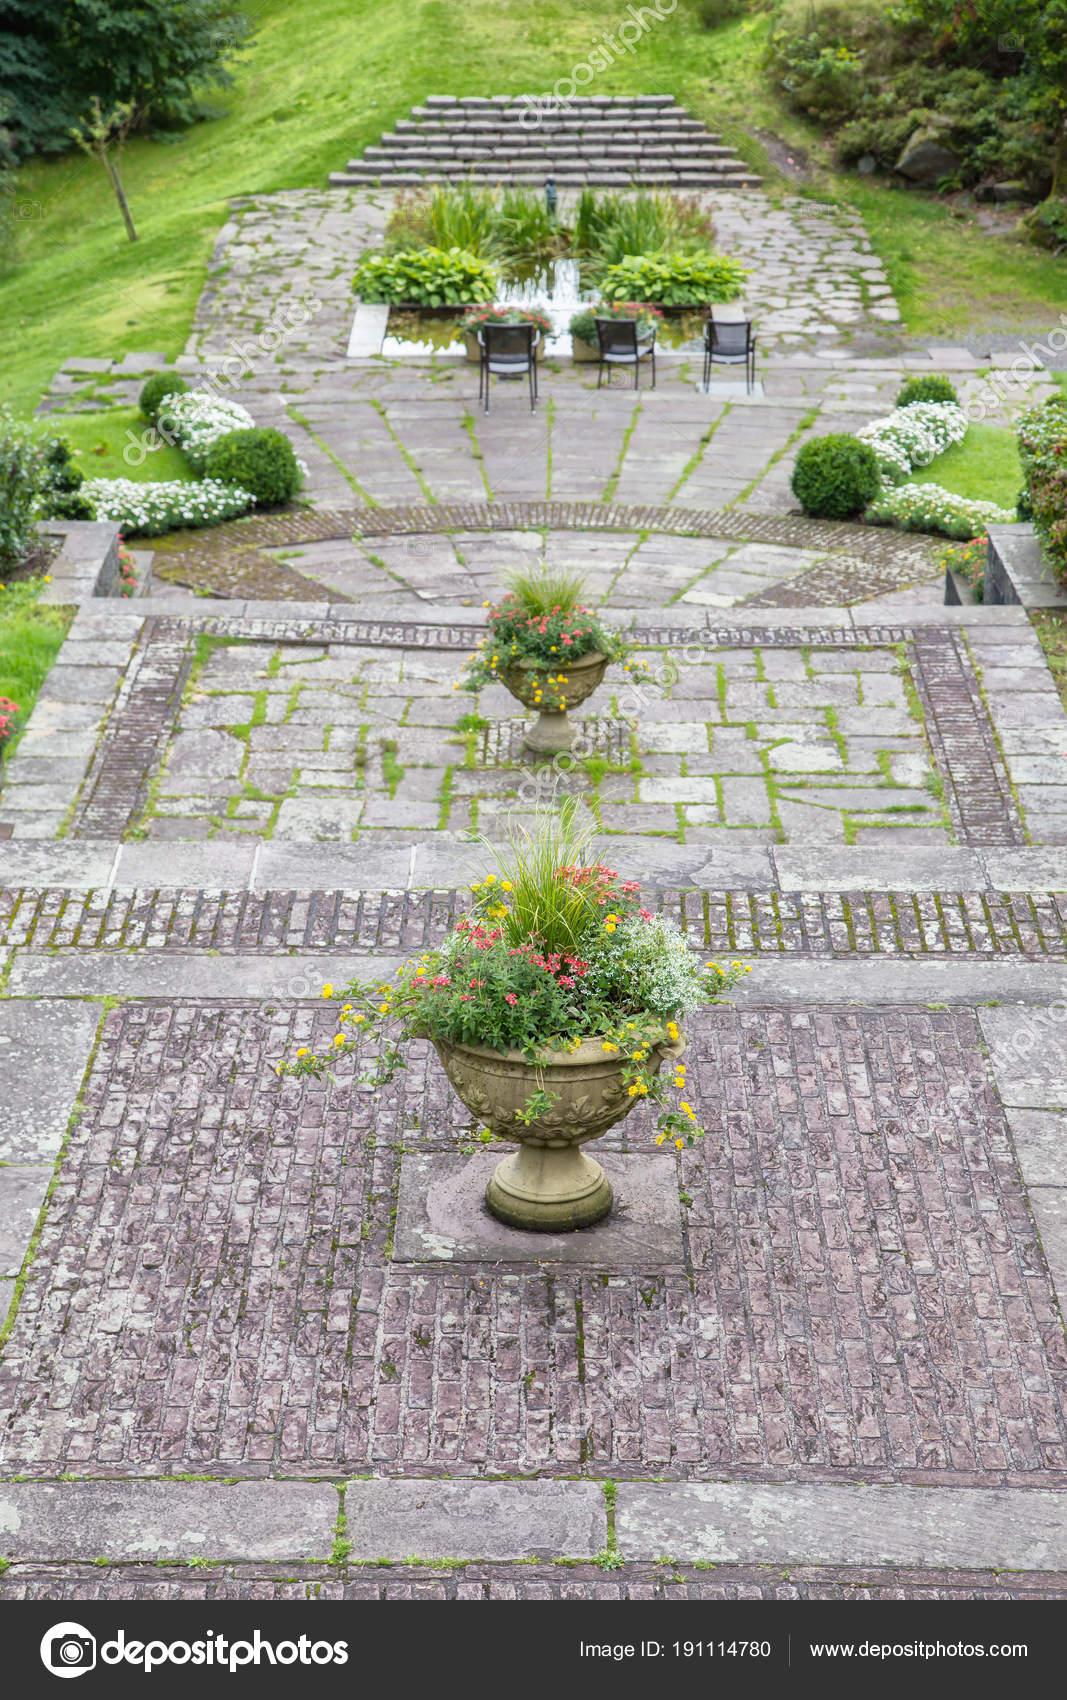 Vasi Da Giardino Grandi.Vasi Da Giardino Cemento Grandi Vintage Con Fiori E Tre